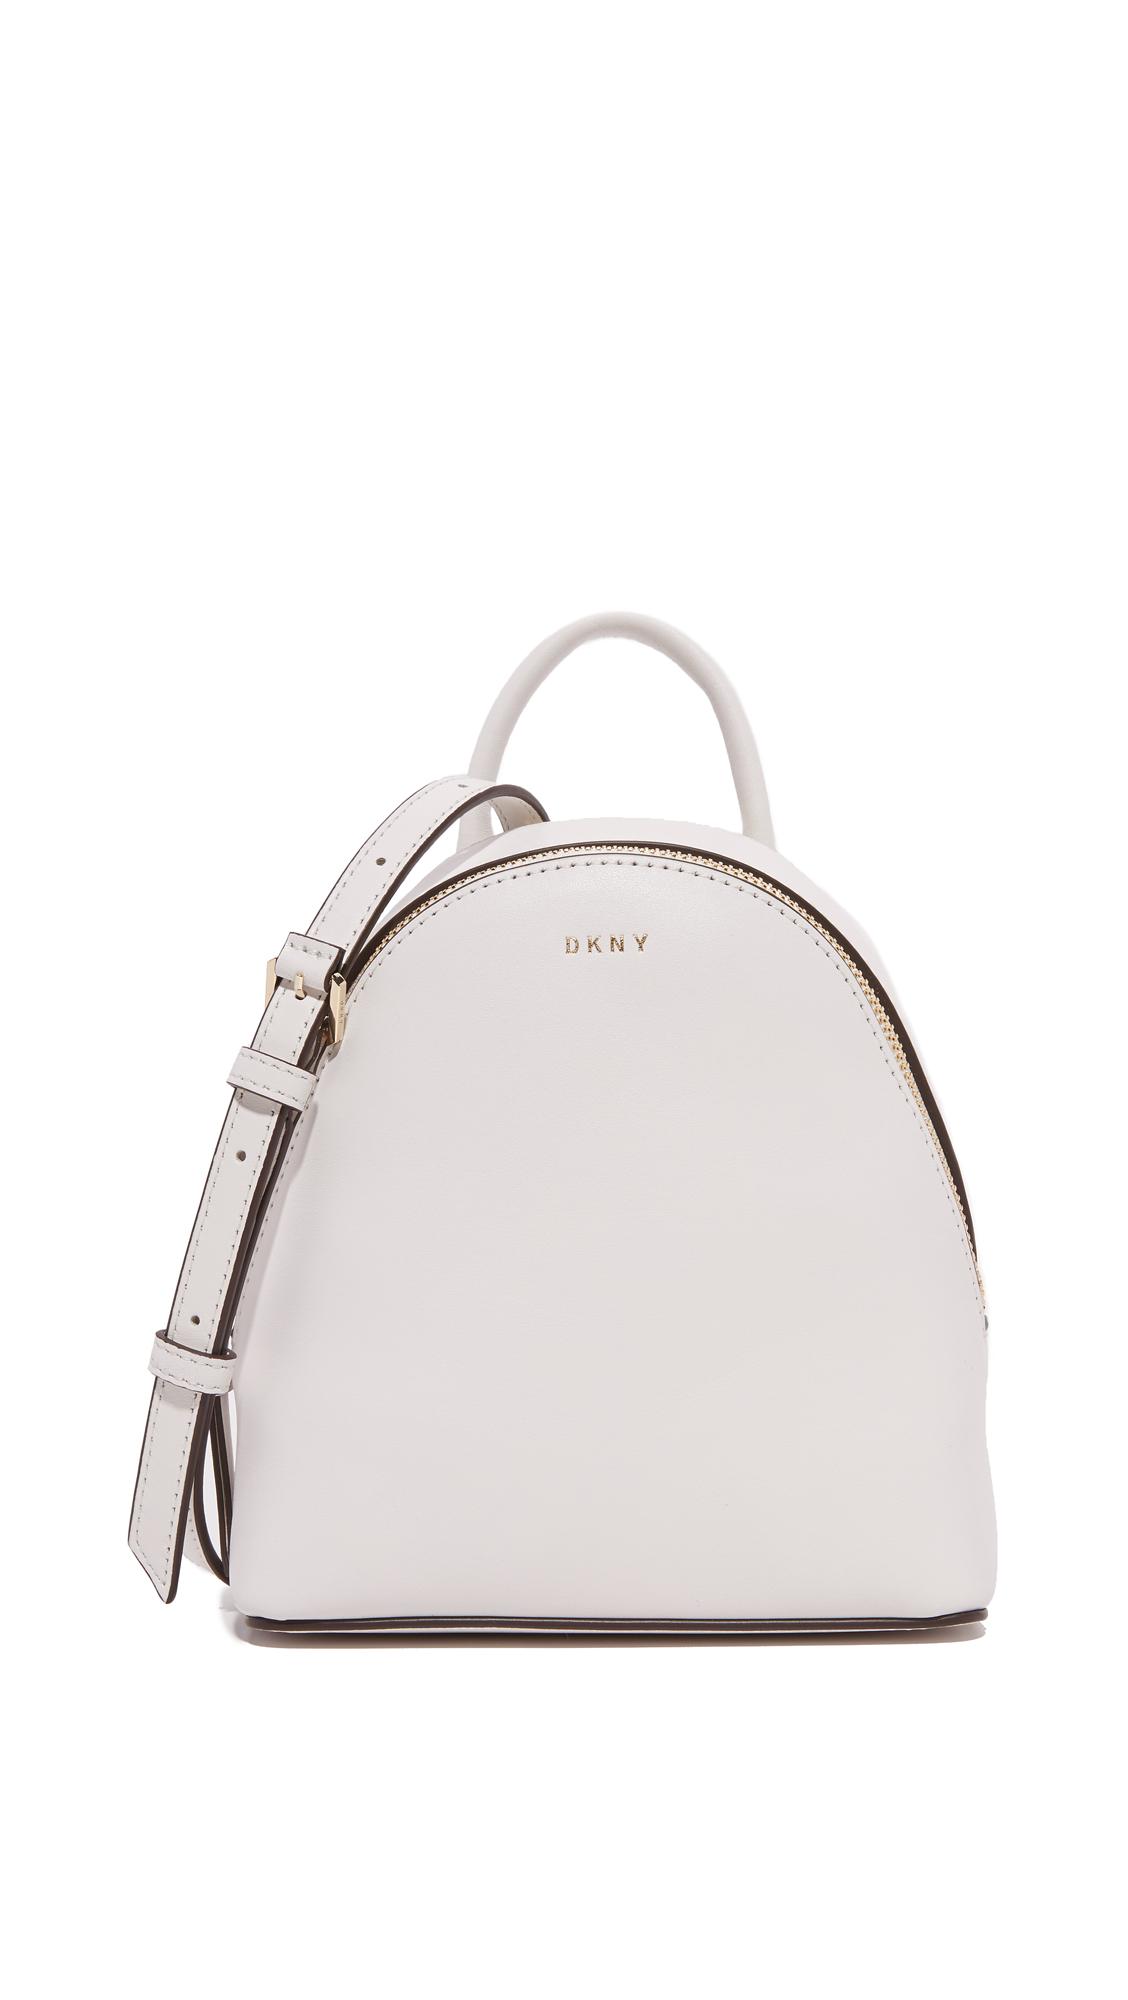 9336103384d7 DKNY Миниатюрная сумка-рюкзак Greenwich | SHOPBOP